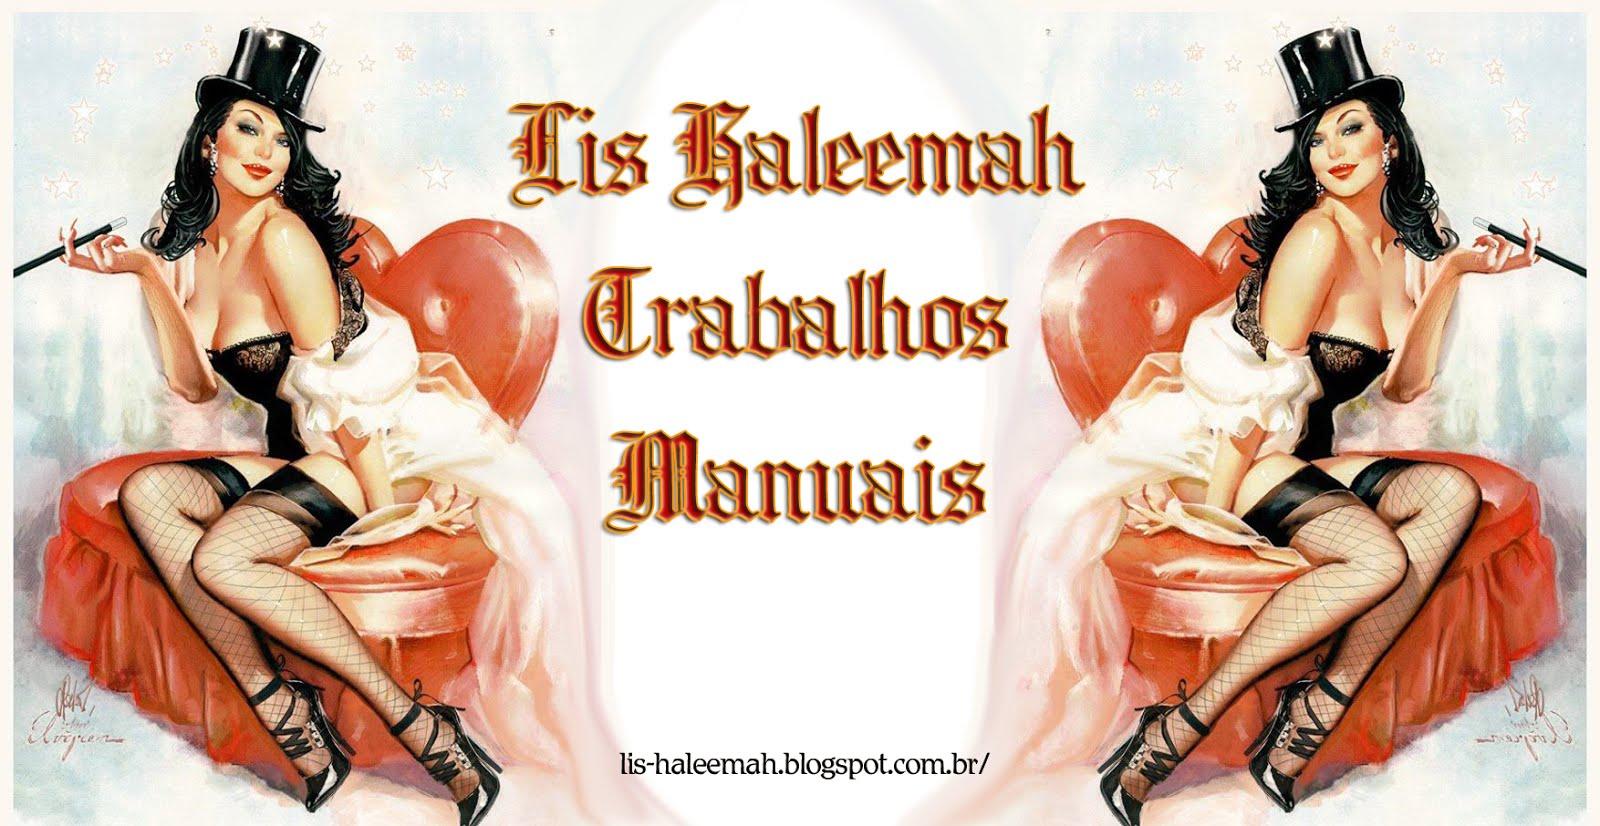 Lis Haleemah - Trabalhos Manuais